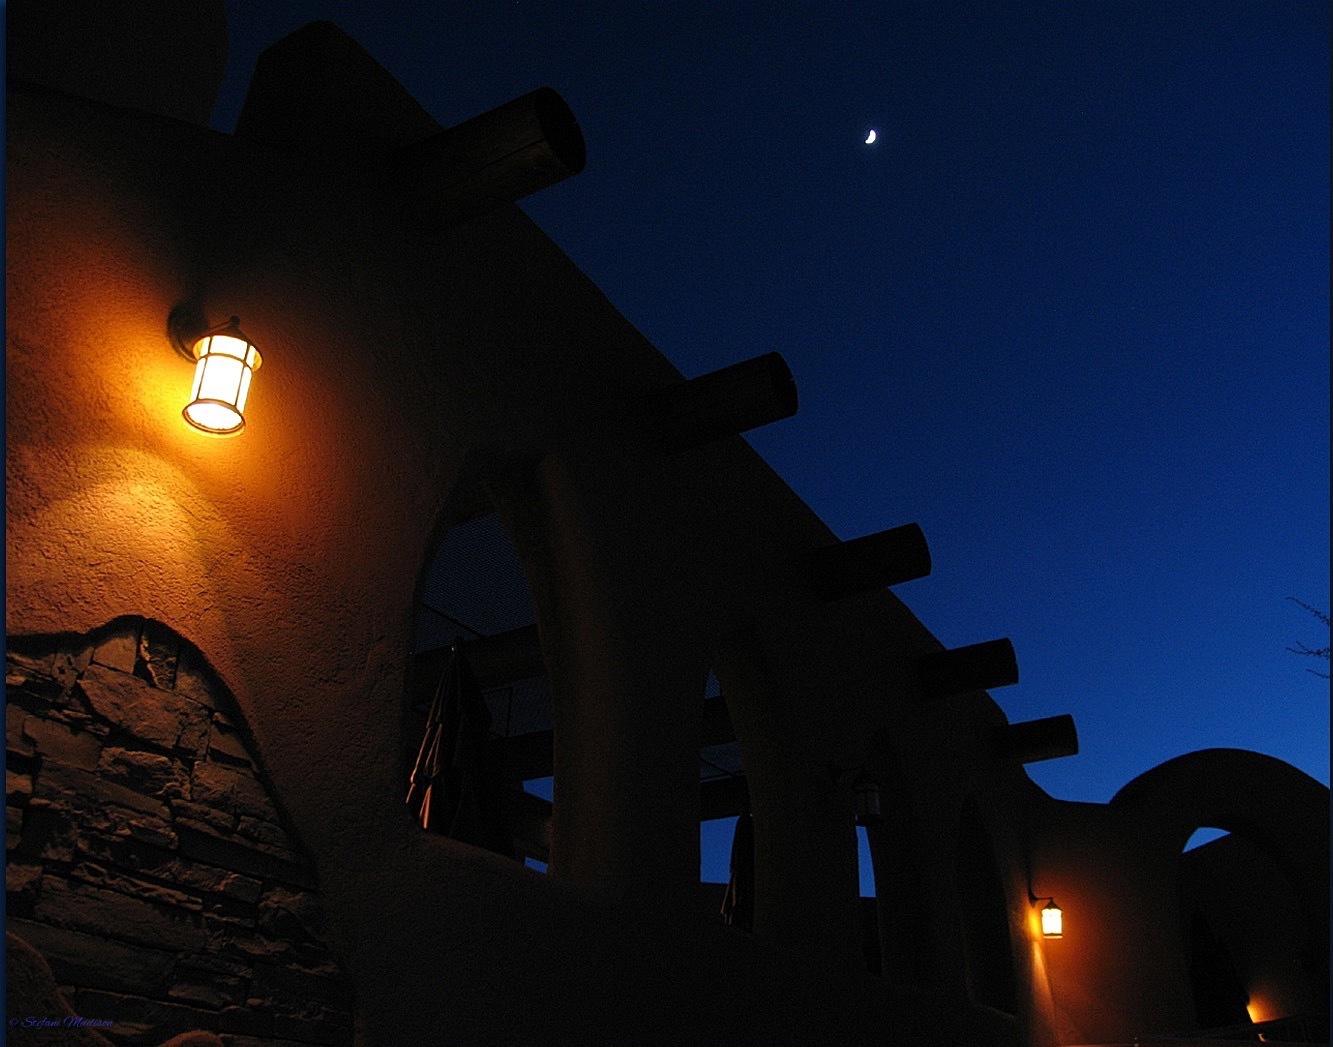 Lamp Shadows by Stefani Madison